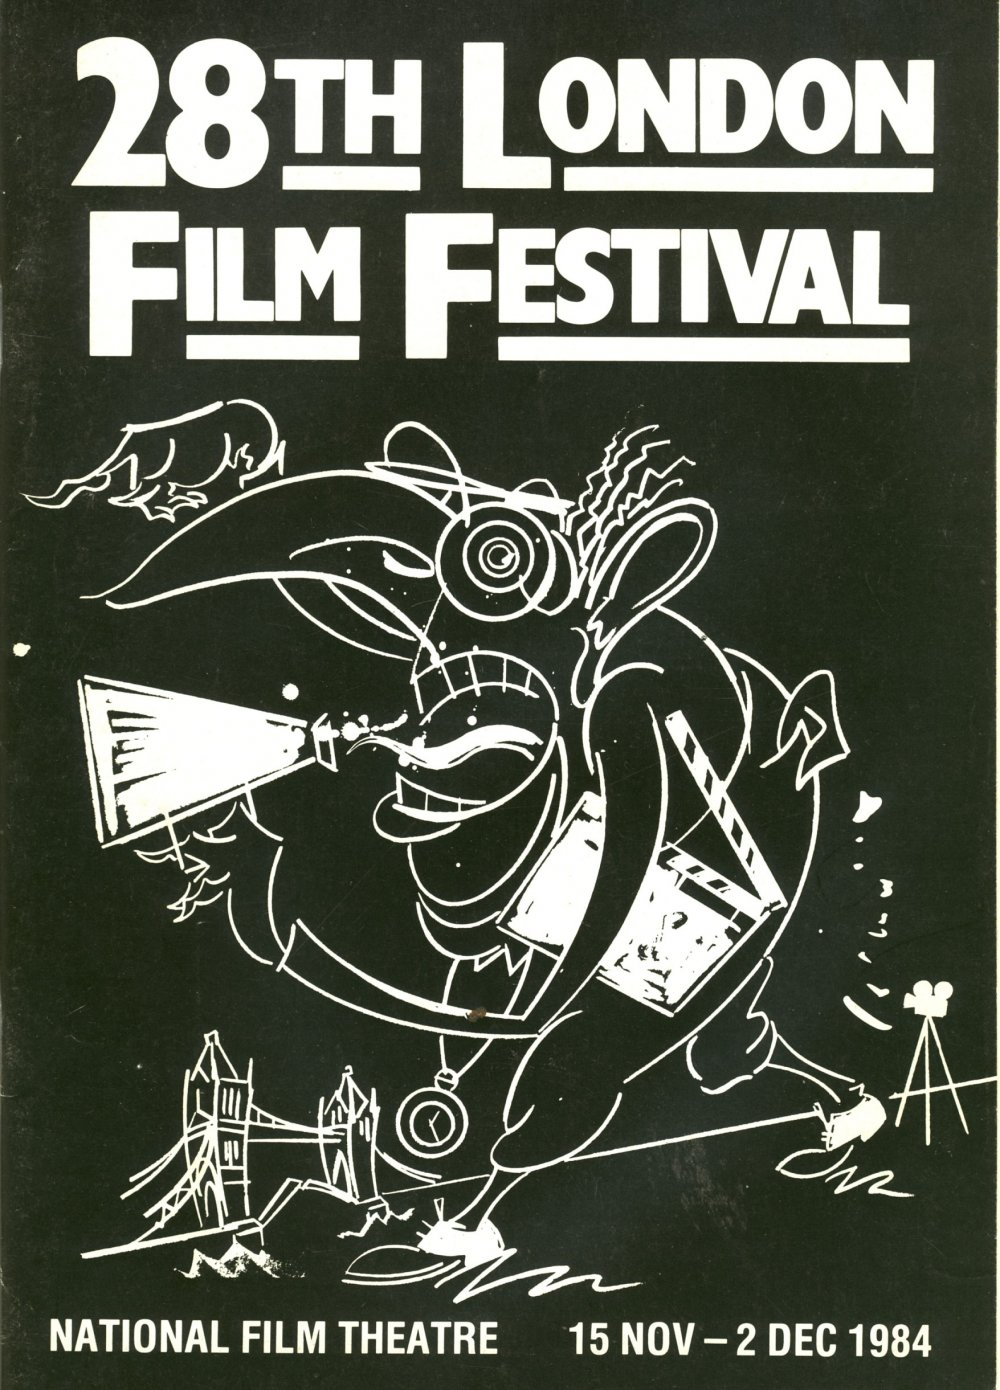 28th London Film Festival poster